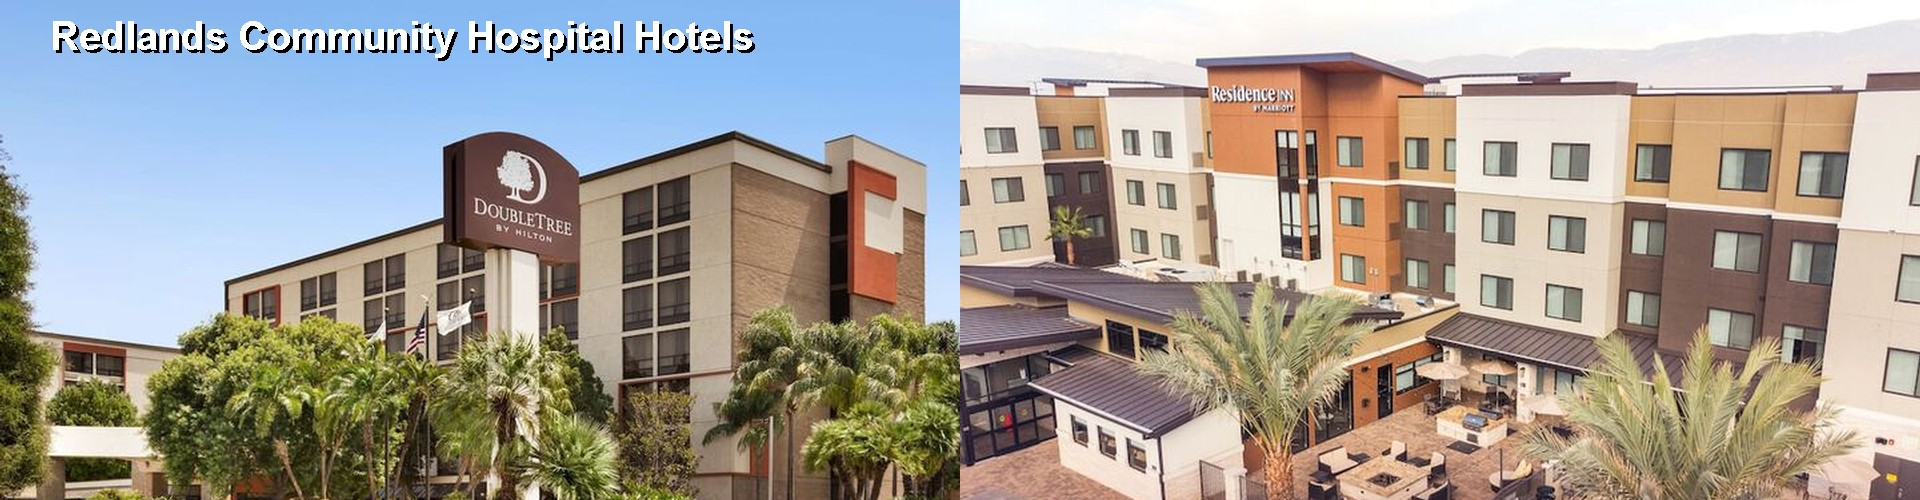 5 Best Hotels Near Redlands Community Hospital